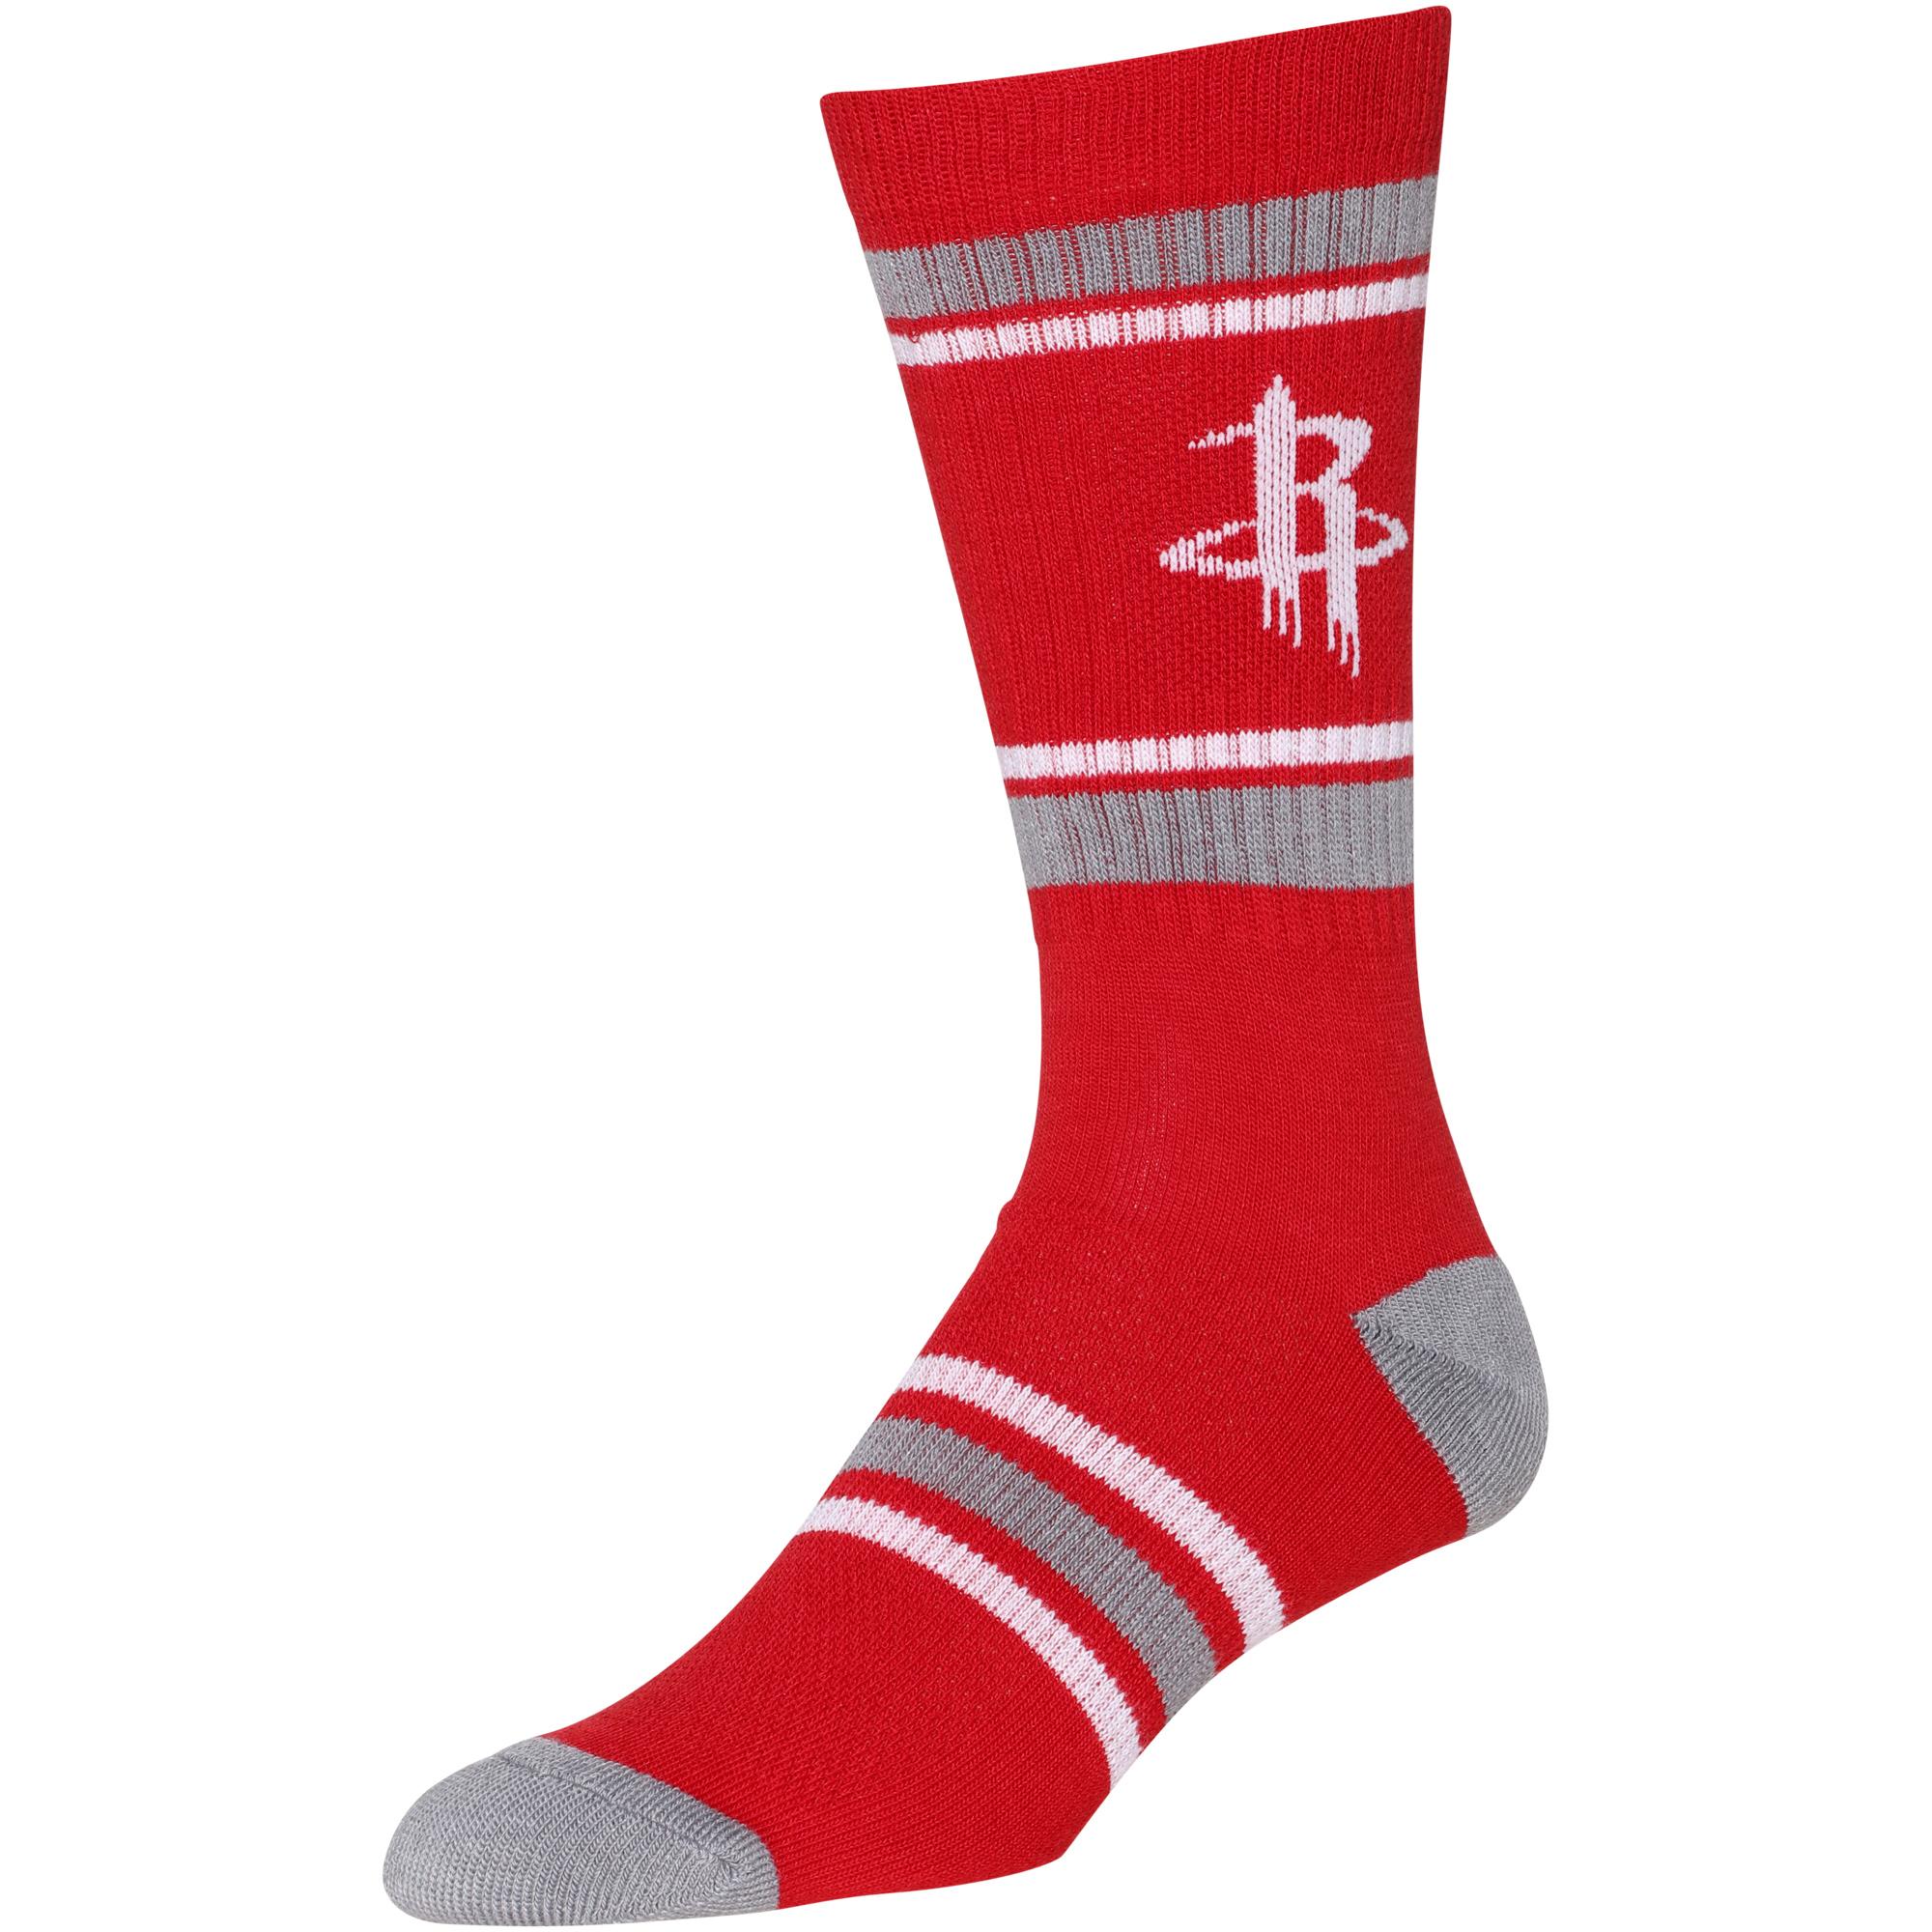 NBA Houston Rockets Men's Large Red Stripe Crew Socks Fits 6-12